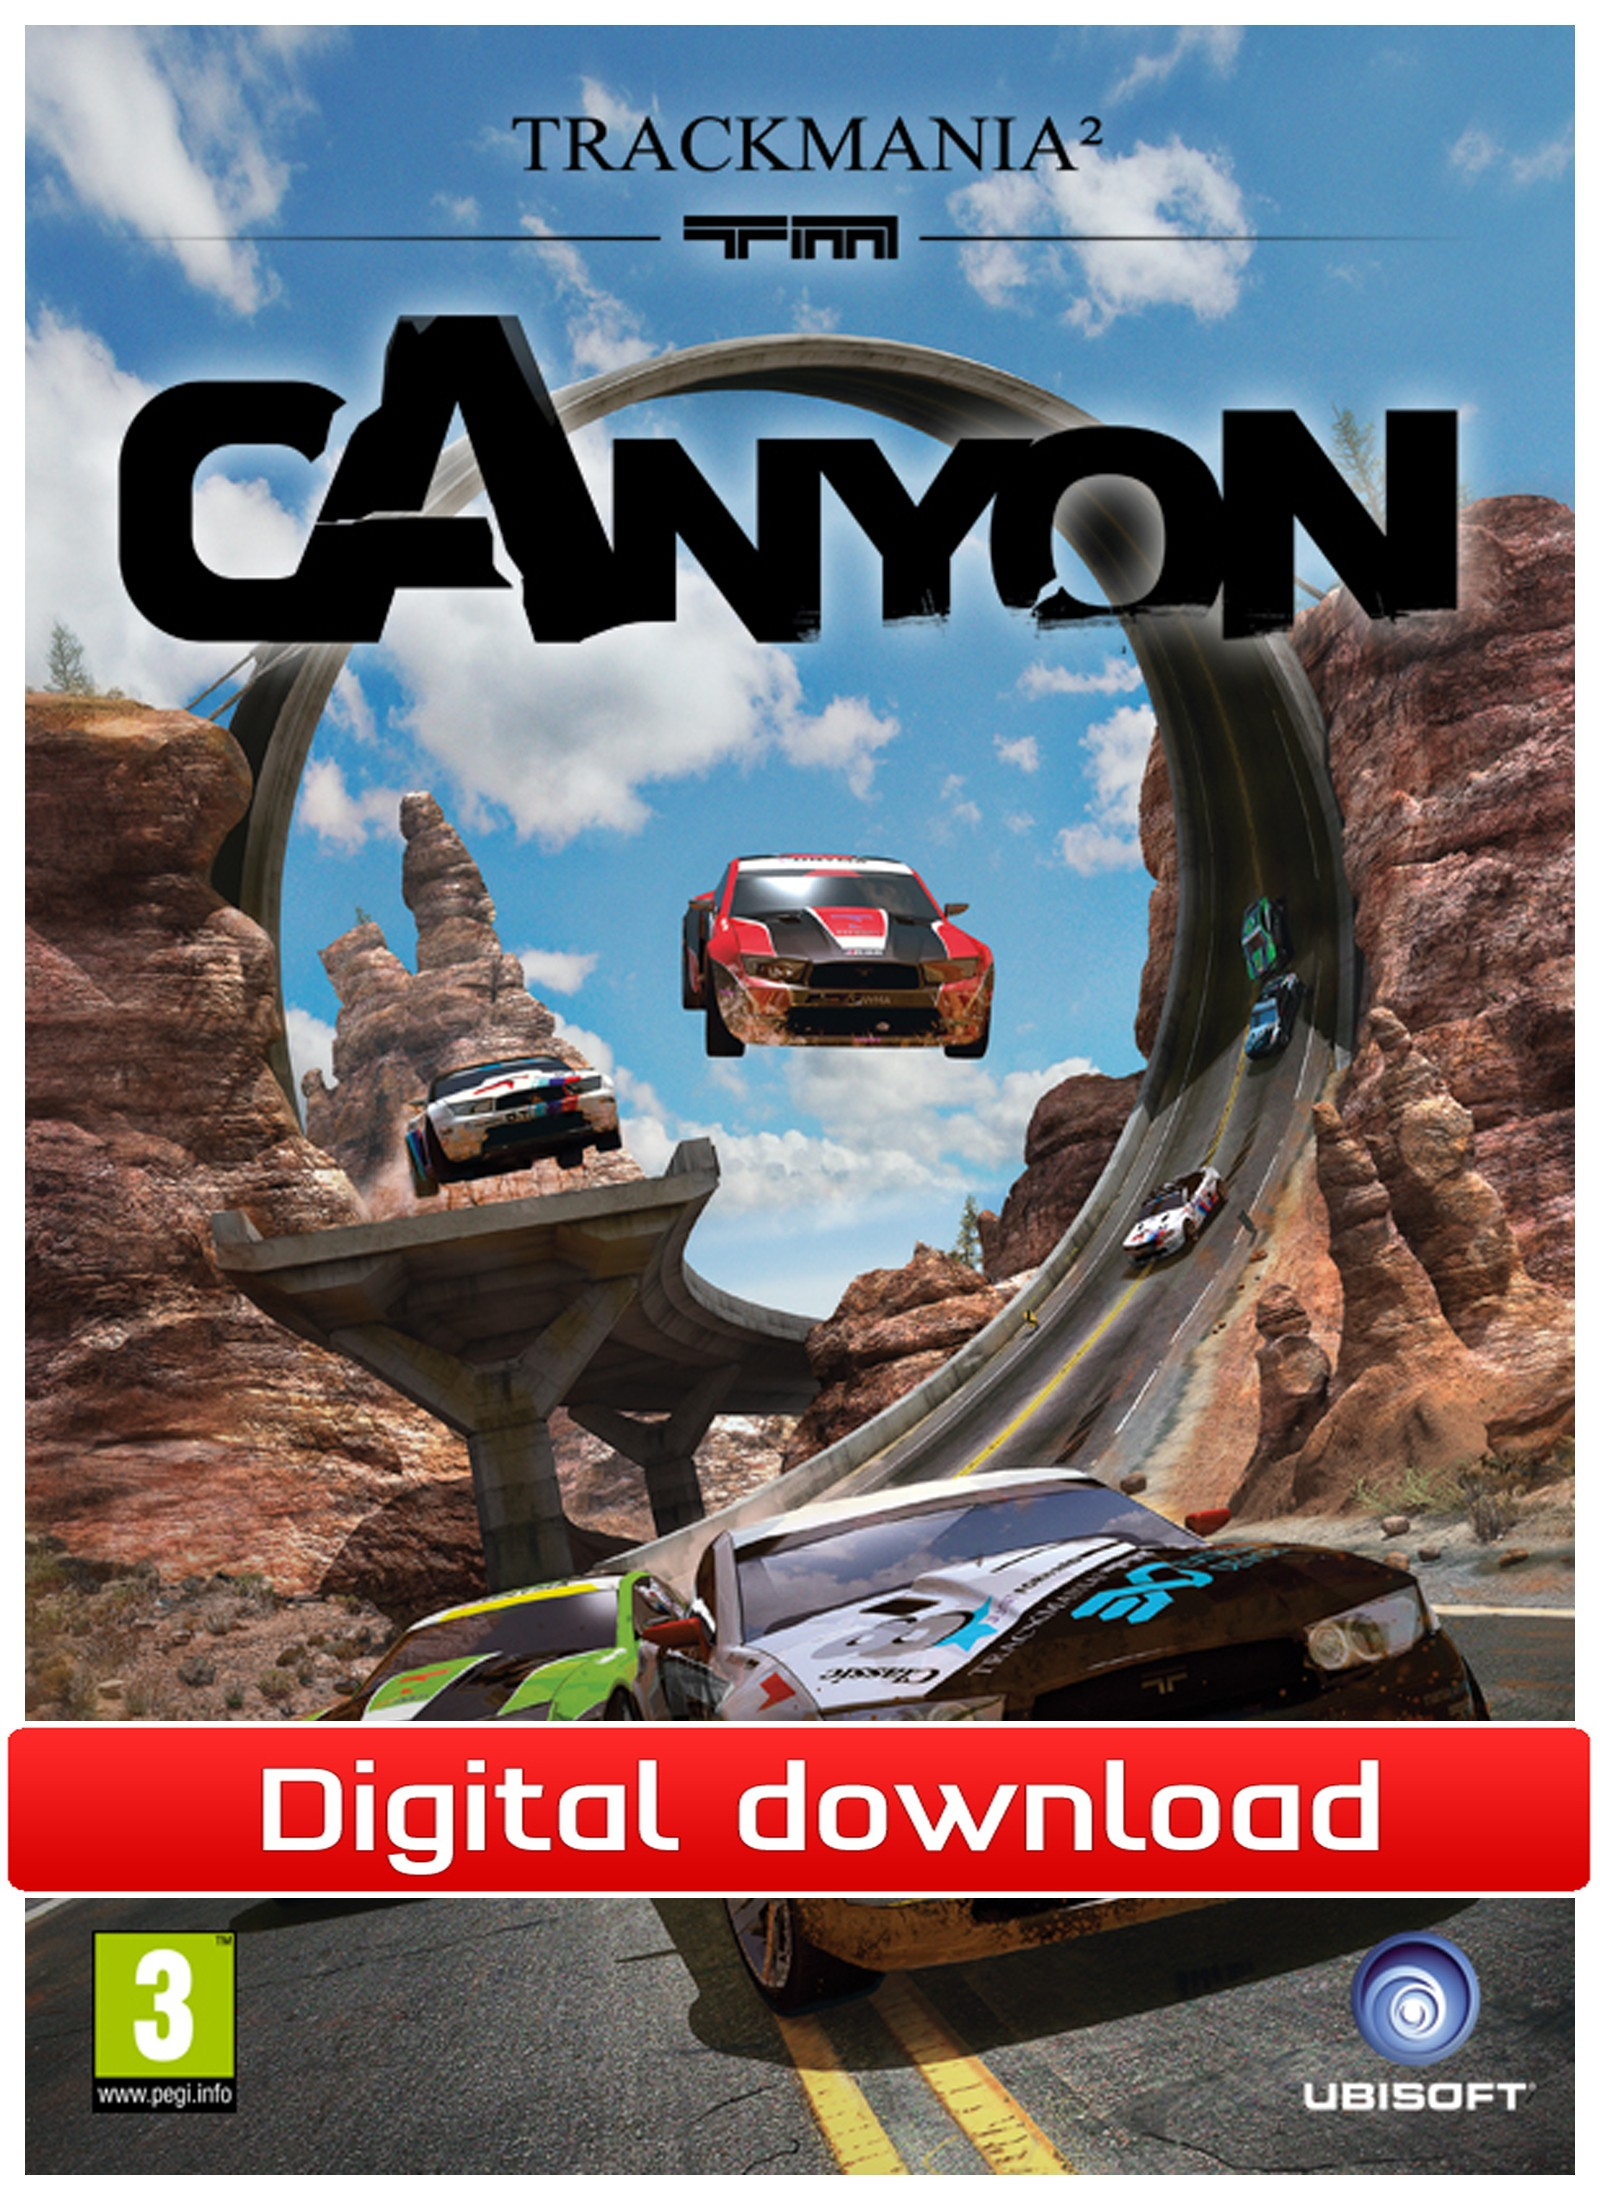 TrackMania² Canyon (PC nedlastning) PCDD32769